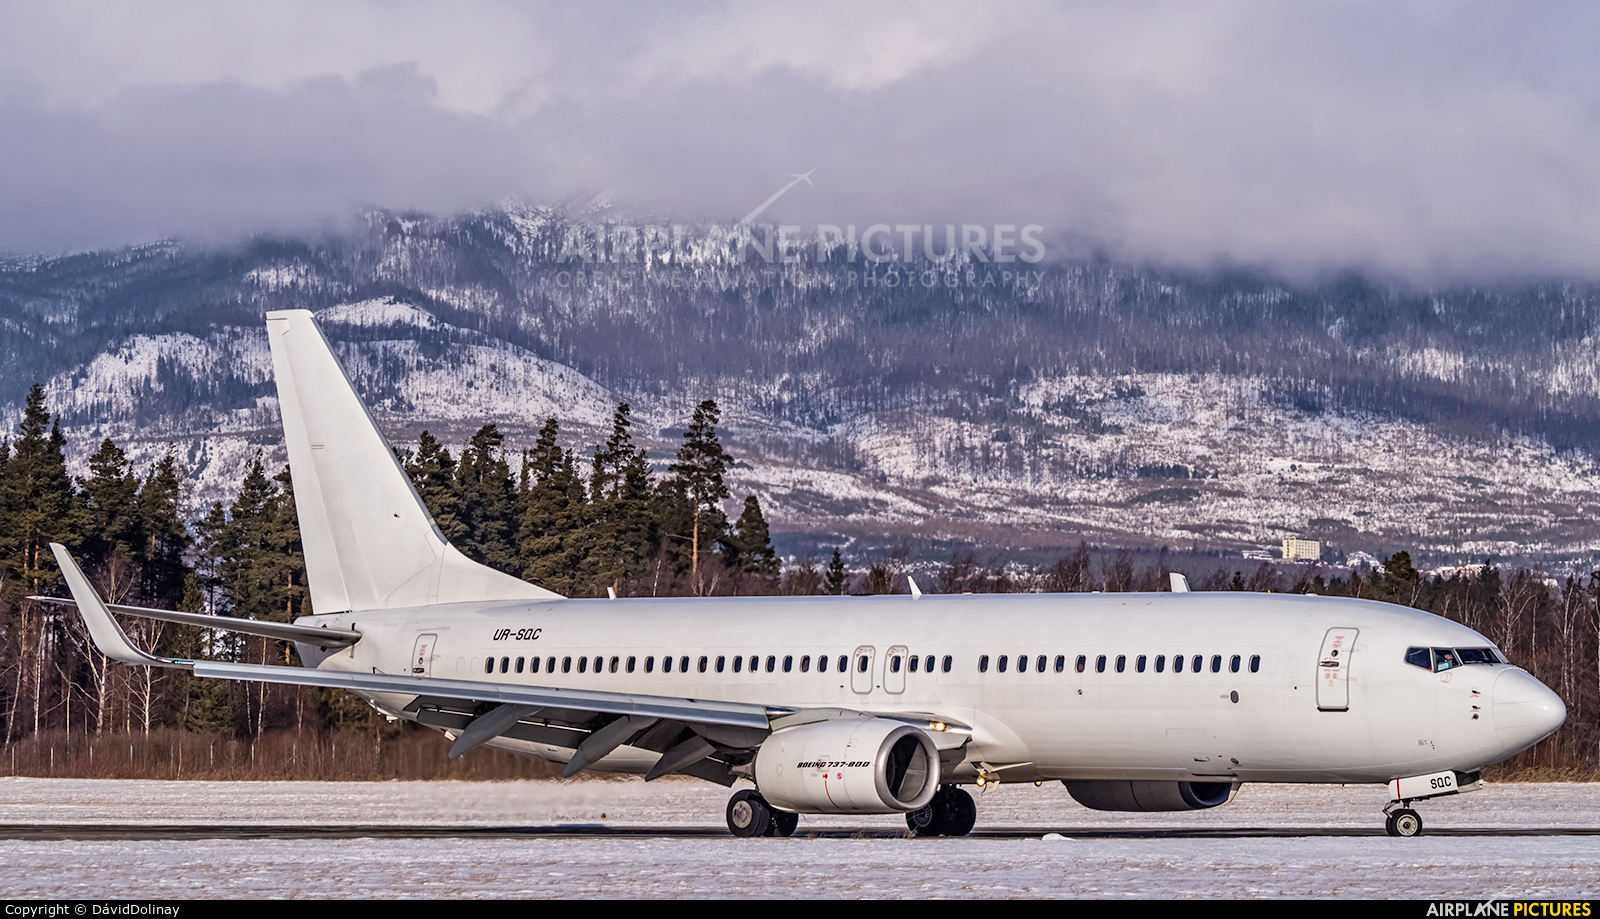 SkyUp Airlines UR-SQC aircraft at Poprad - Tatry